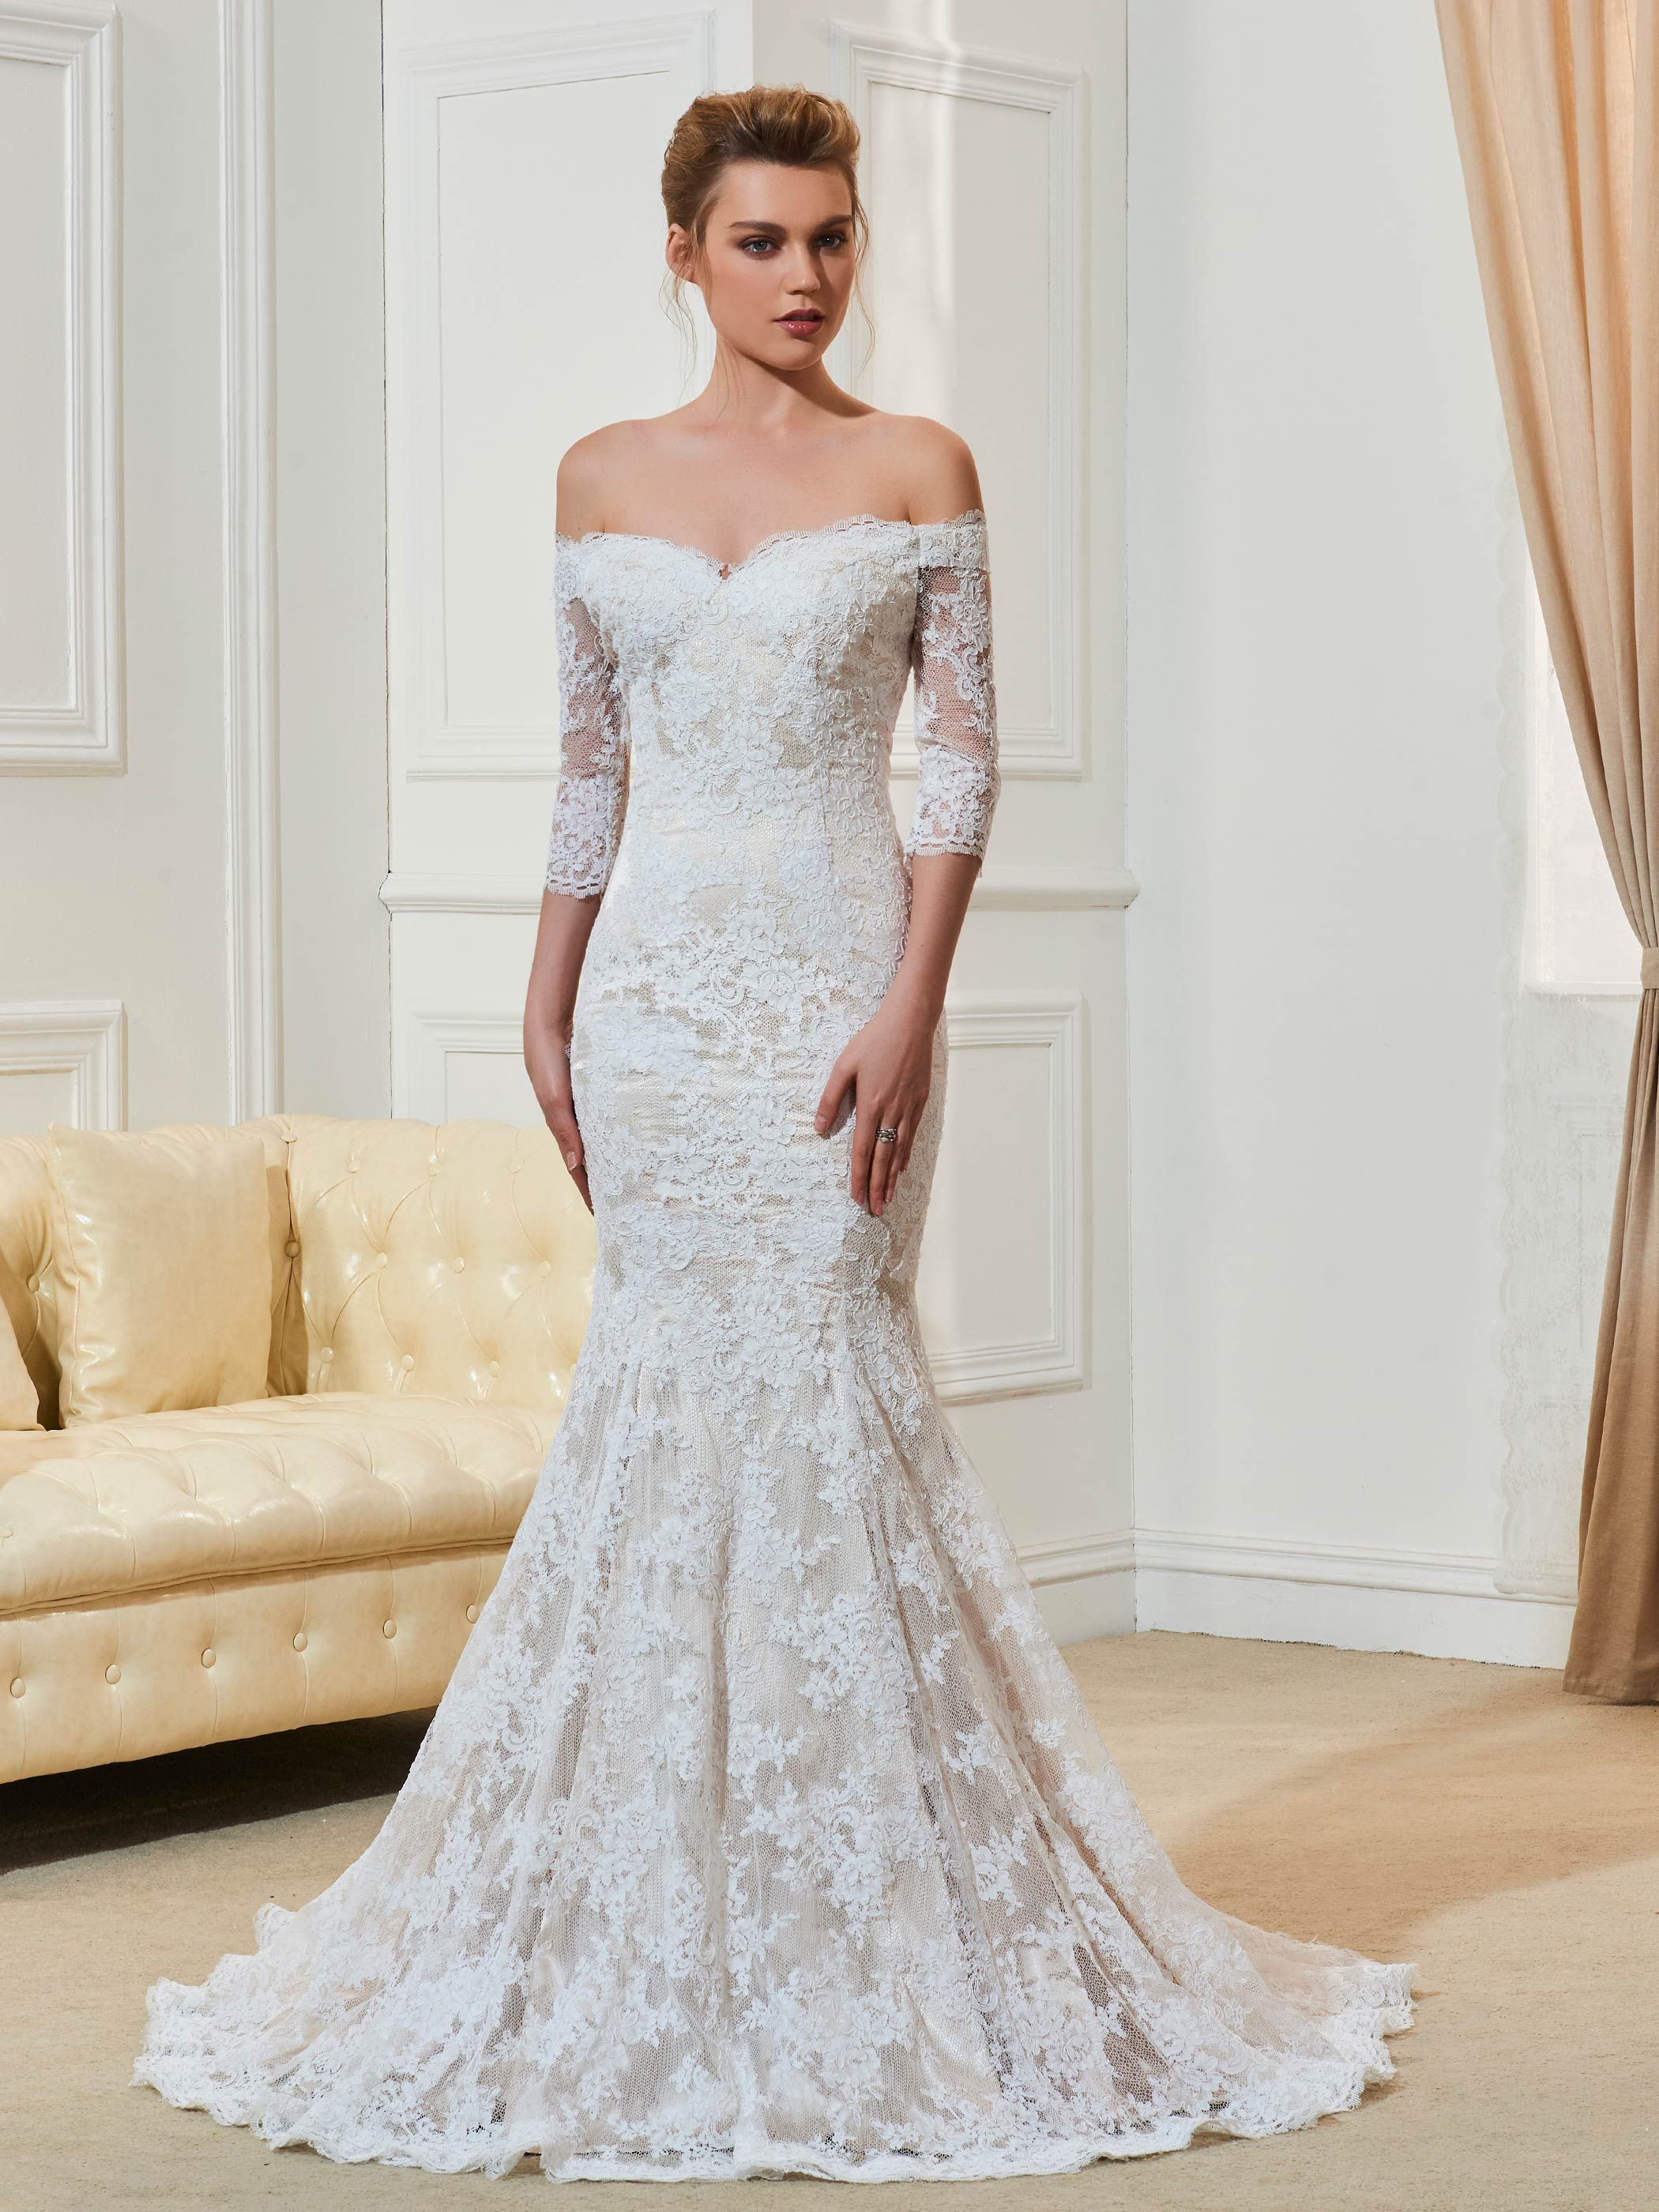 Off the shoulder half sleeve lace mermaid wedding dress bridal